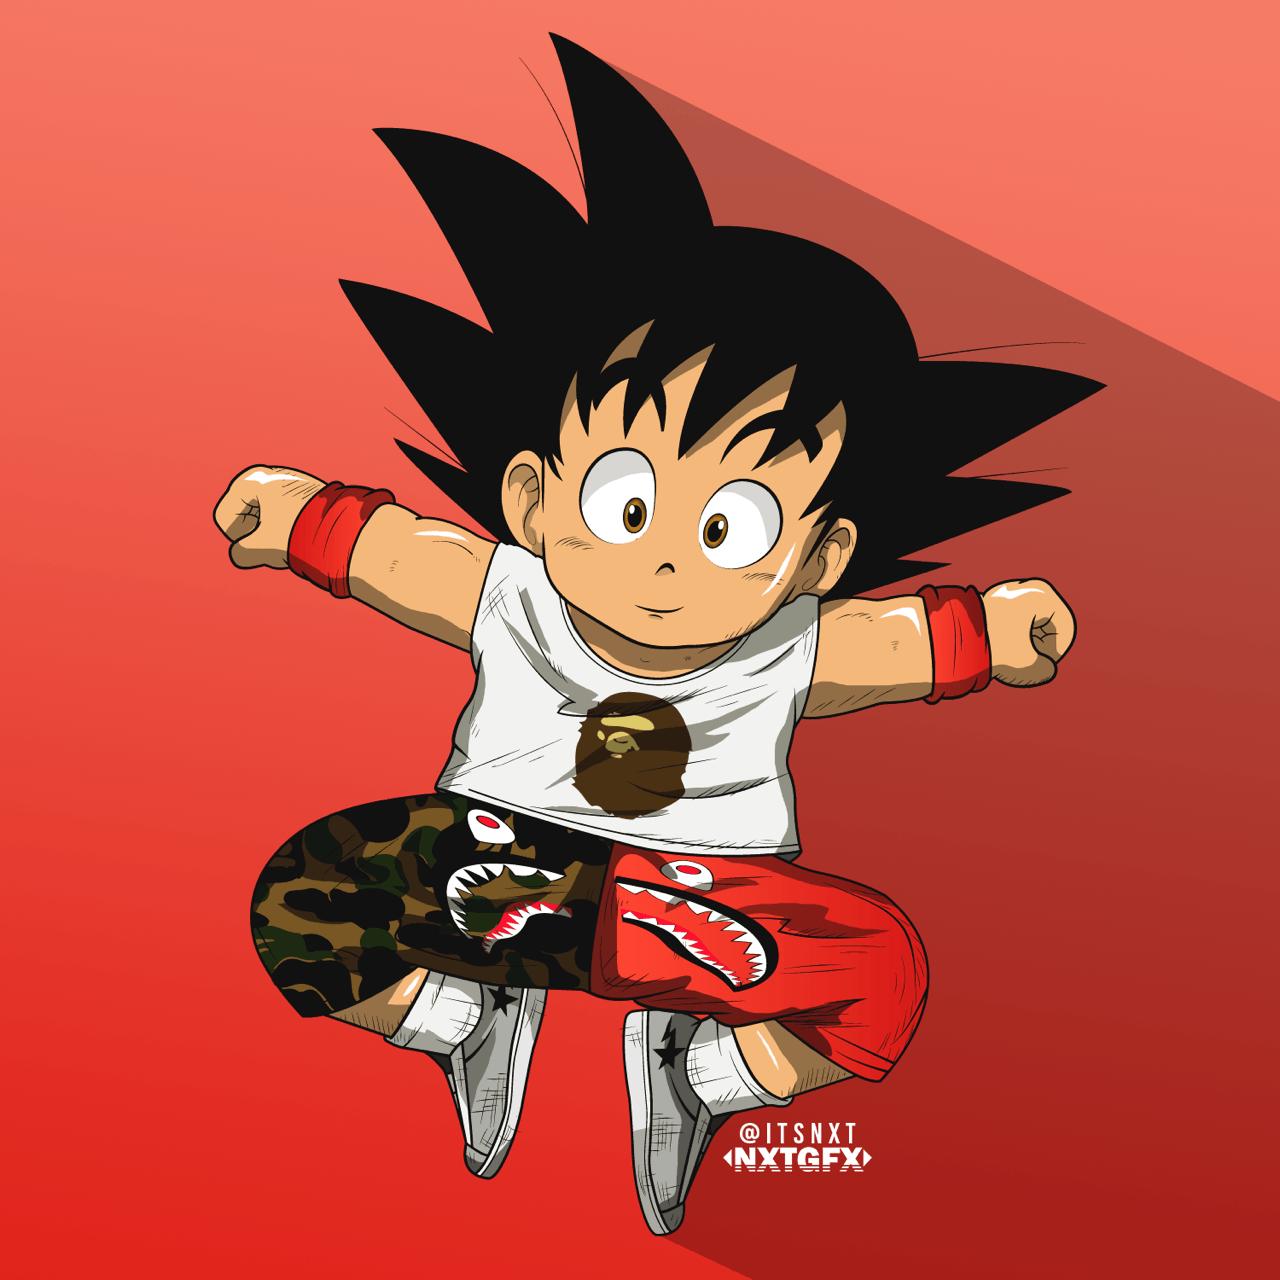 Nxtgfx Goku X Bape Art By A Blog About